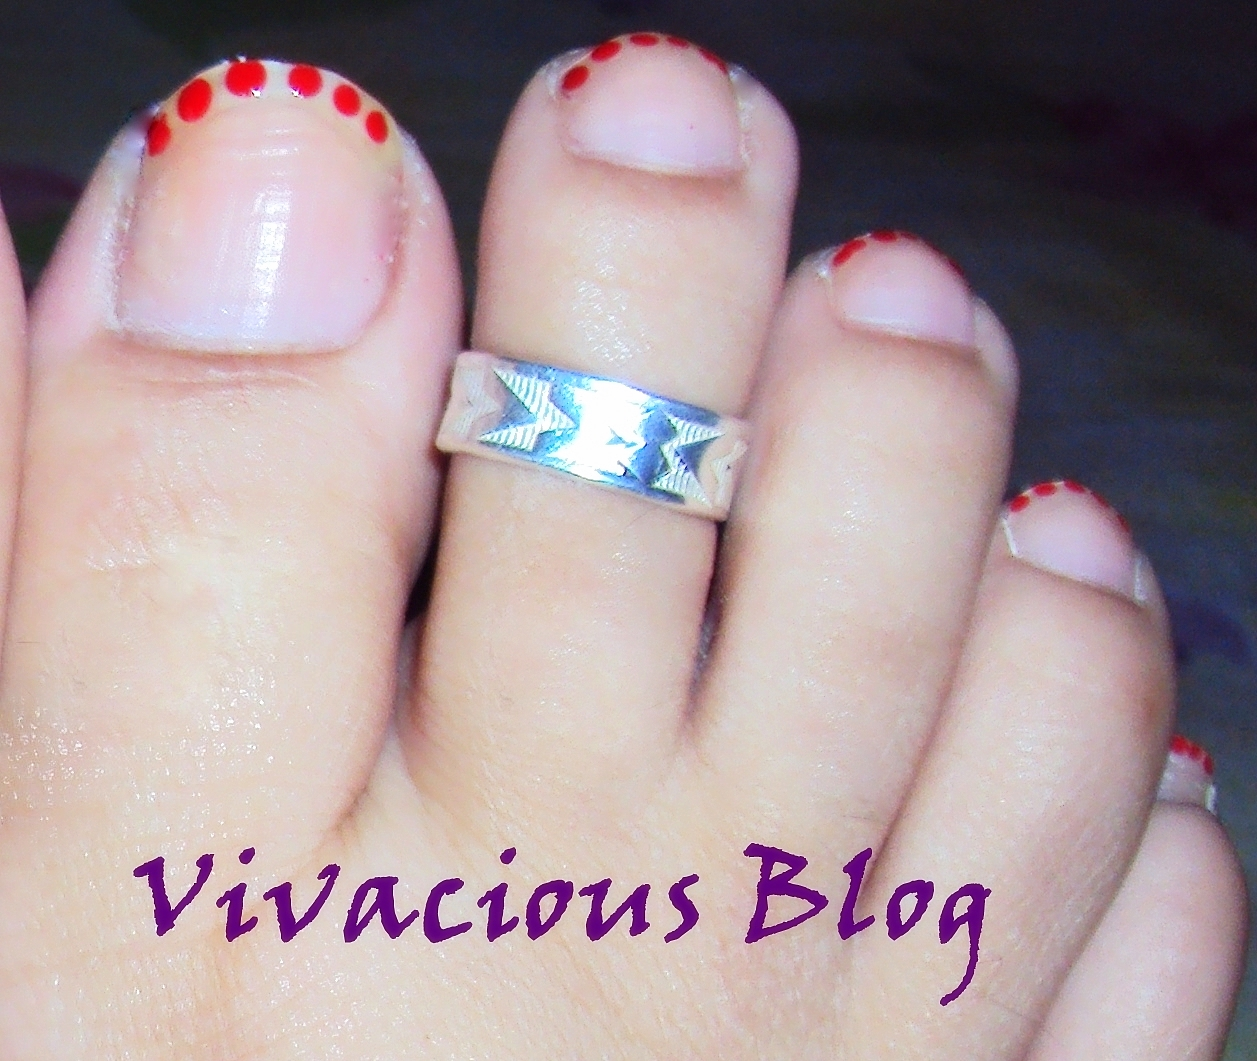 Vivacious Blog: Simple Nail Art For Diwali